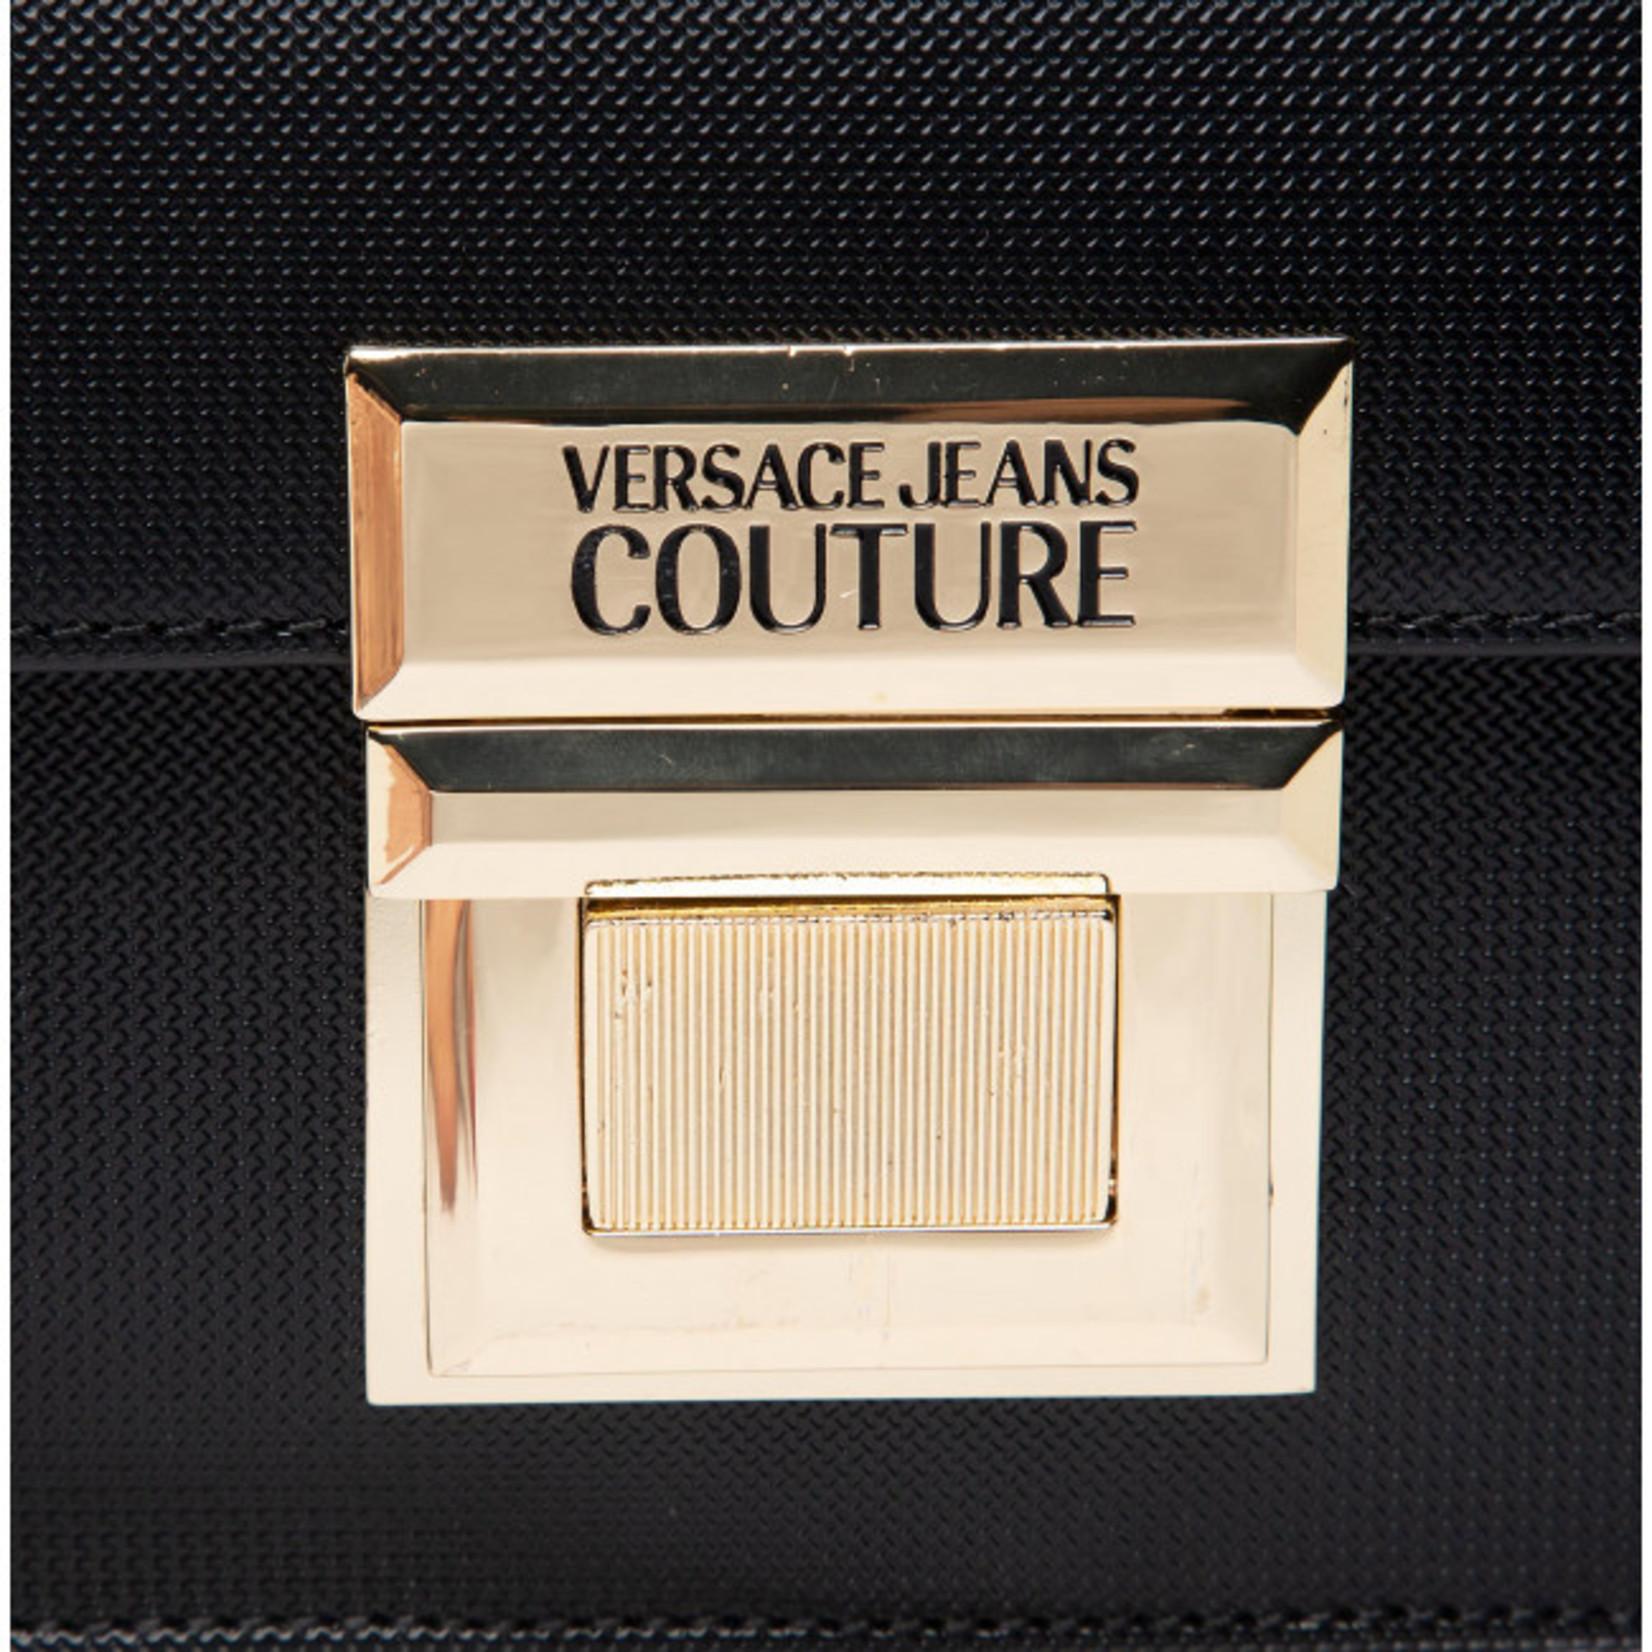 VERSACE JEANS COUTURE VERSACE JEANS COUTURE WOMEN'S BAG RANGE 2 NEW LOOK - 71VA4B23